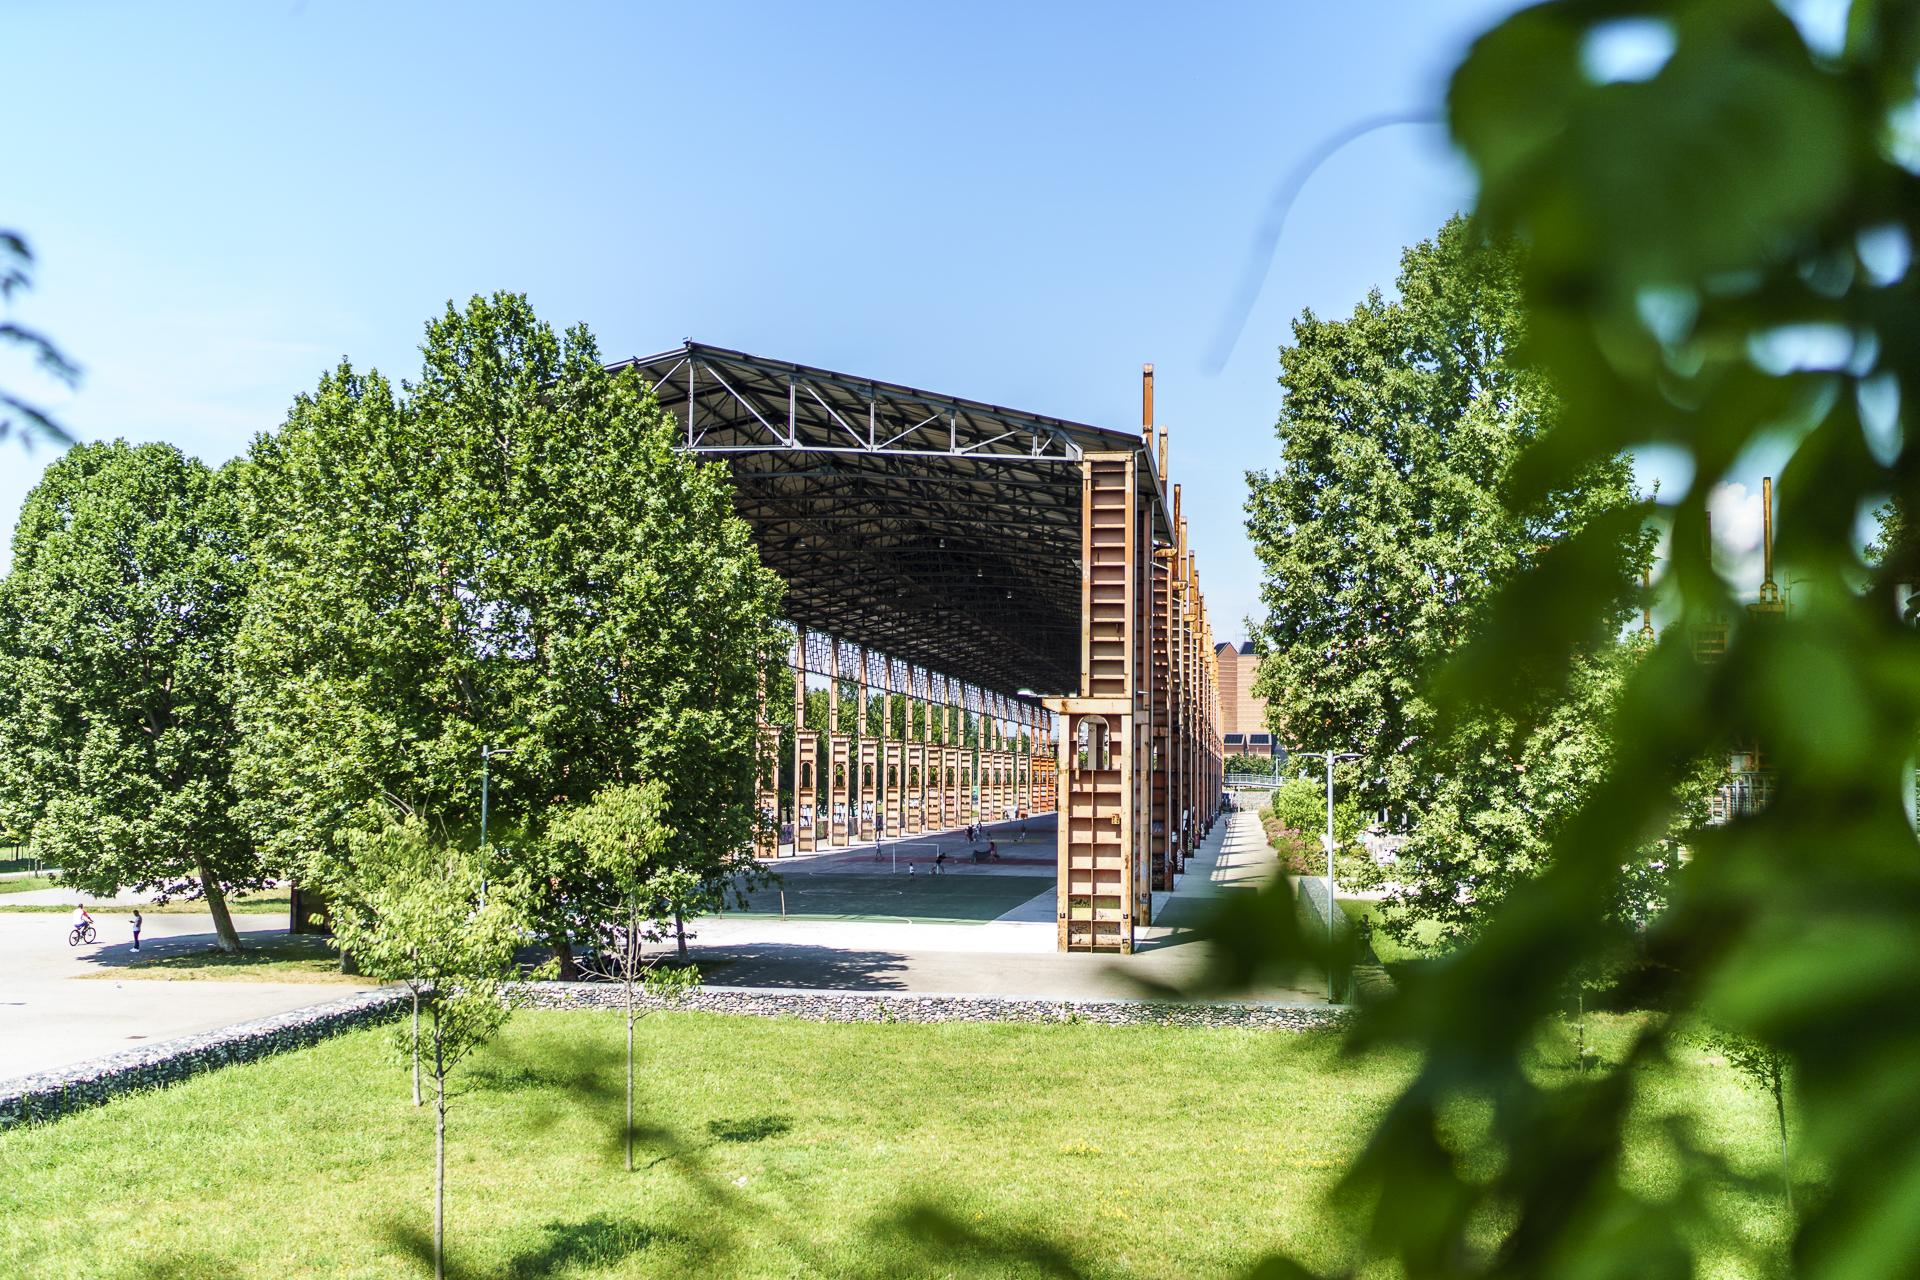 Parco Dora Turin